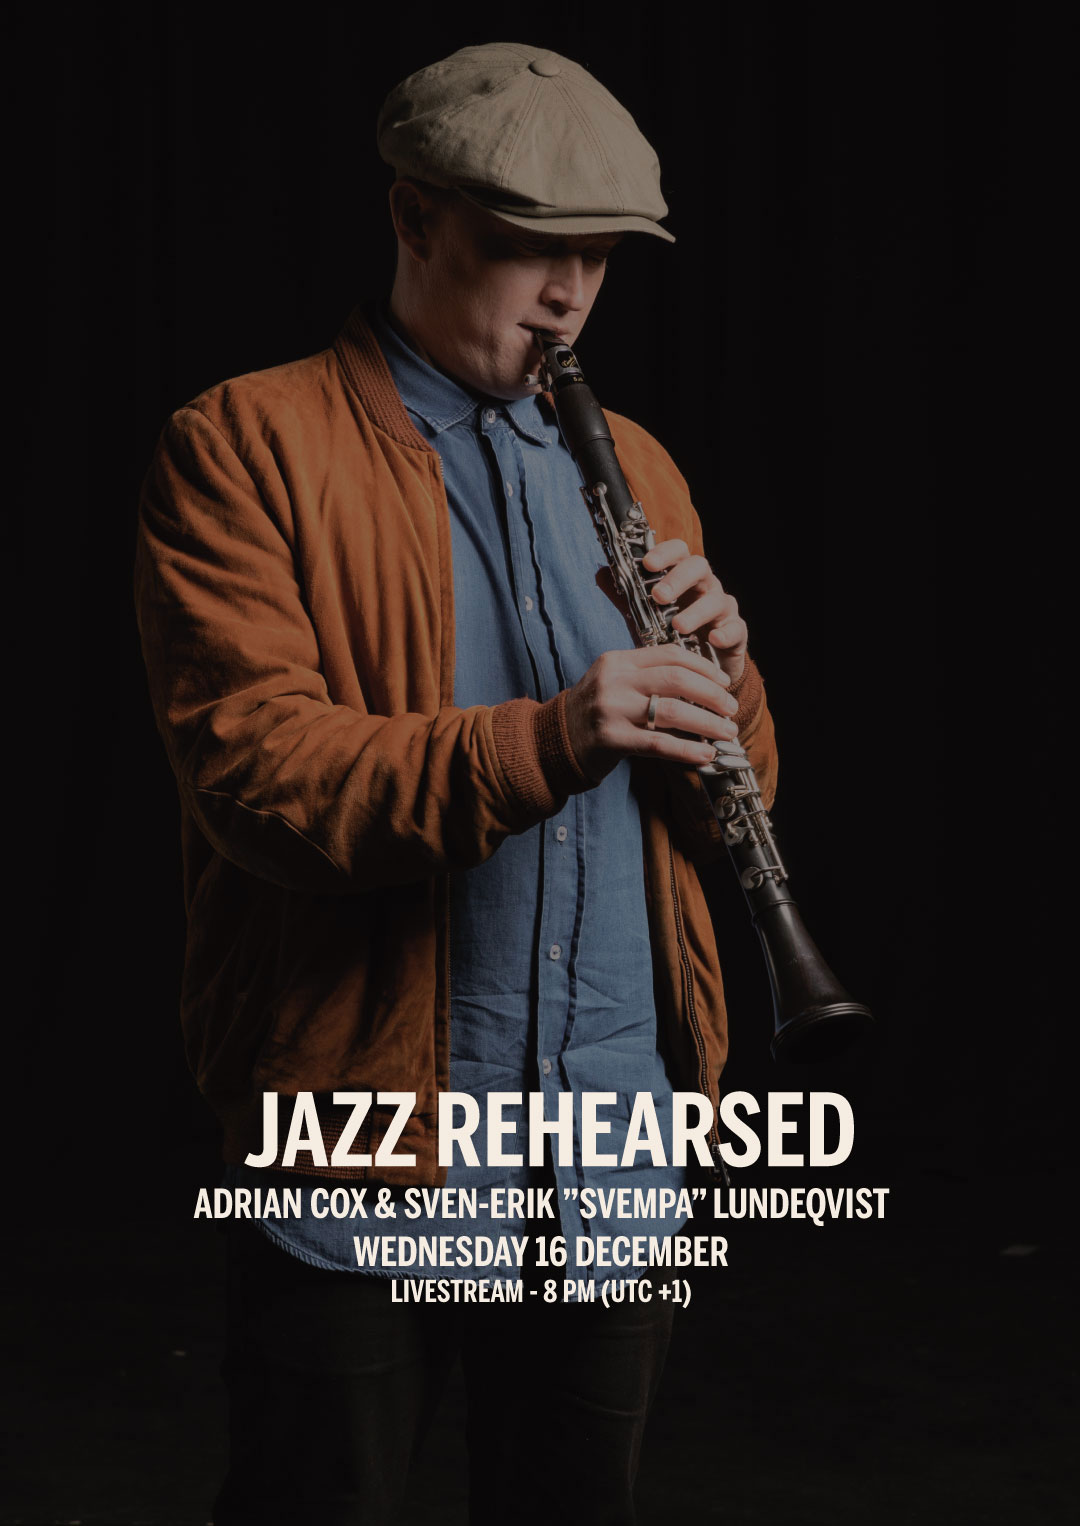 "201216 : Jazz Rehearsed with Adrian Cox & Sven-Erik ""Svempa"" Lundeqvist – LIVESTREAM"